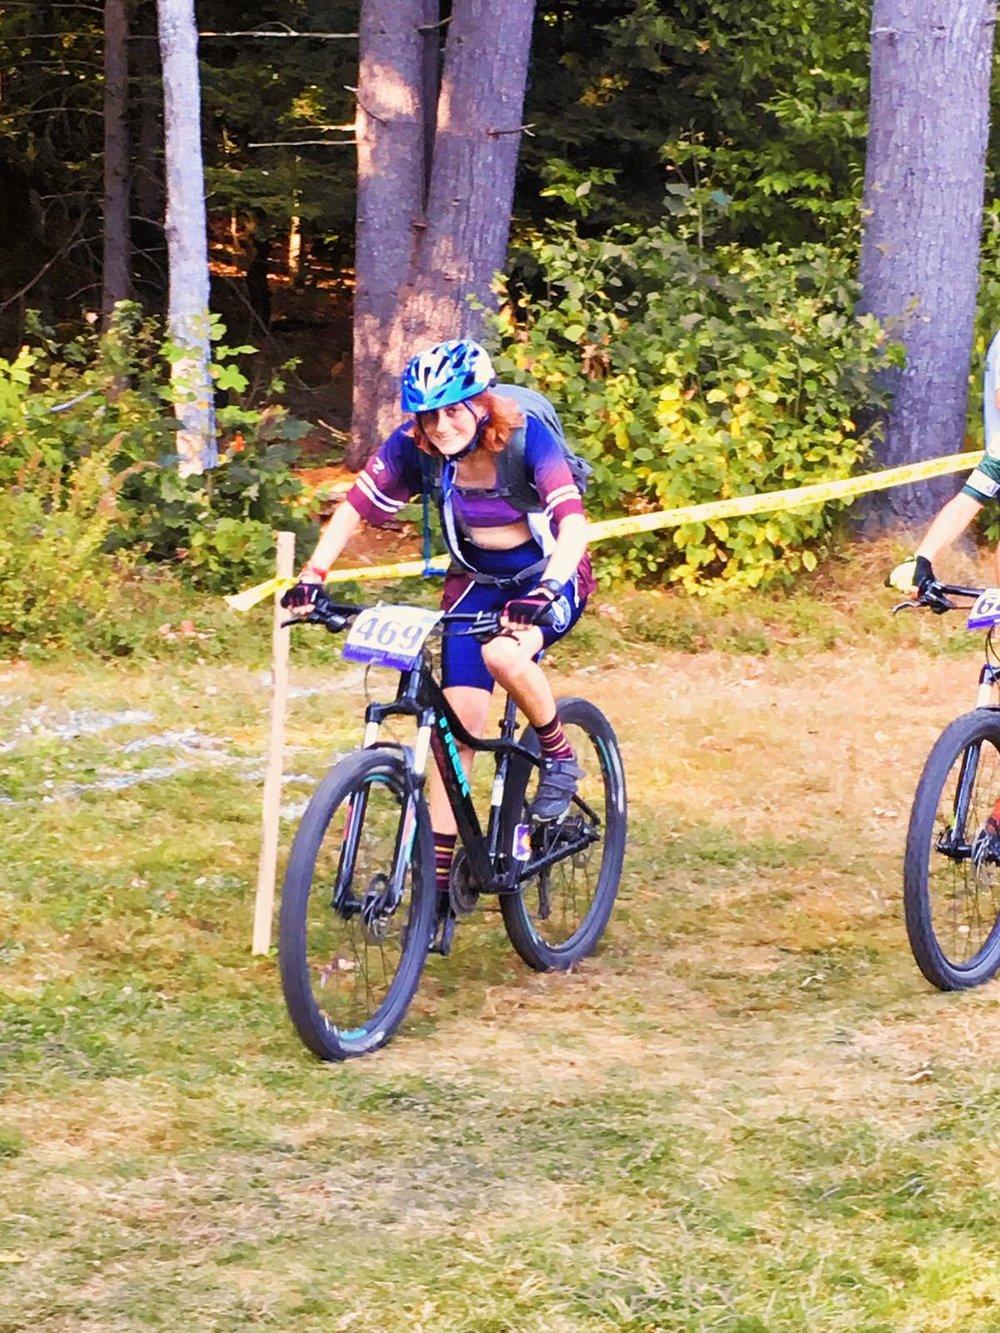 Mountain Biking at Vermont Academy - September 27, 2017  - 7948.JPG